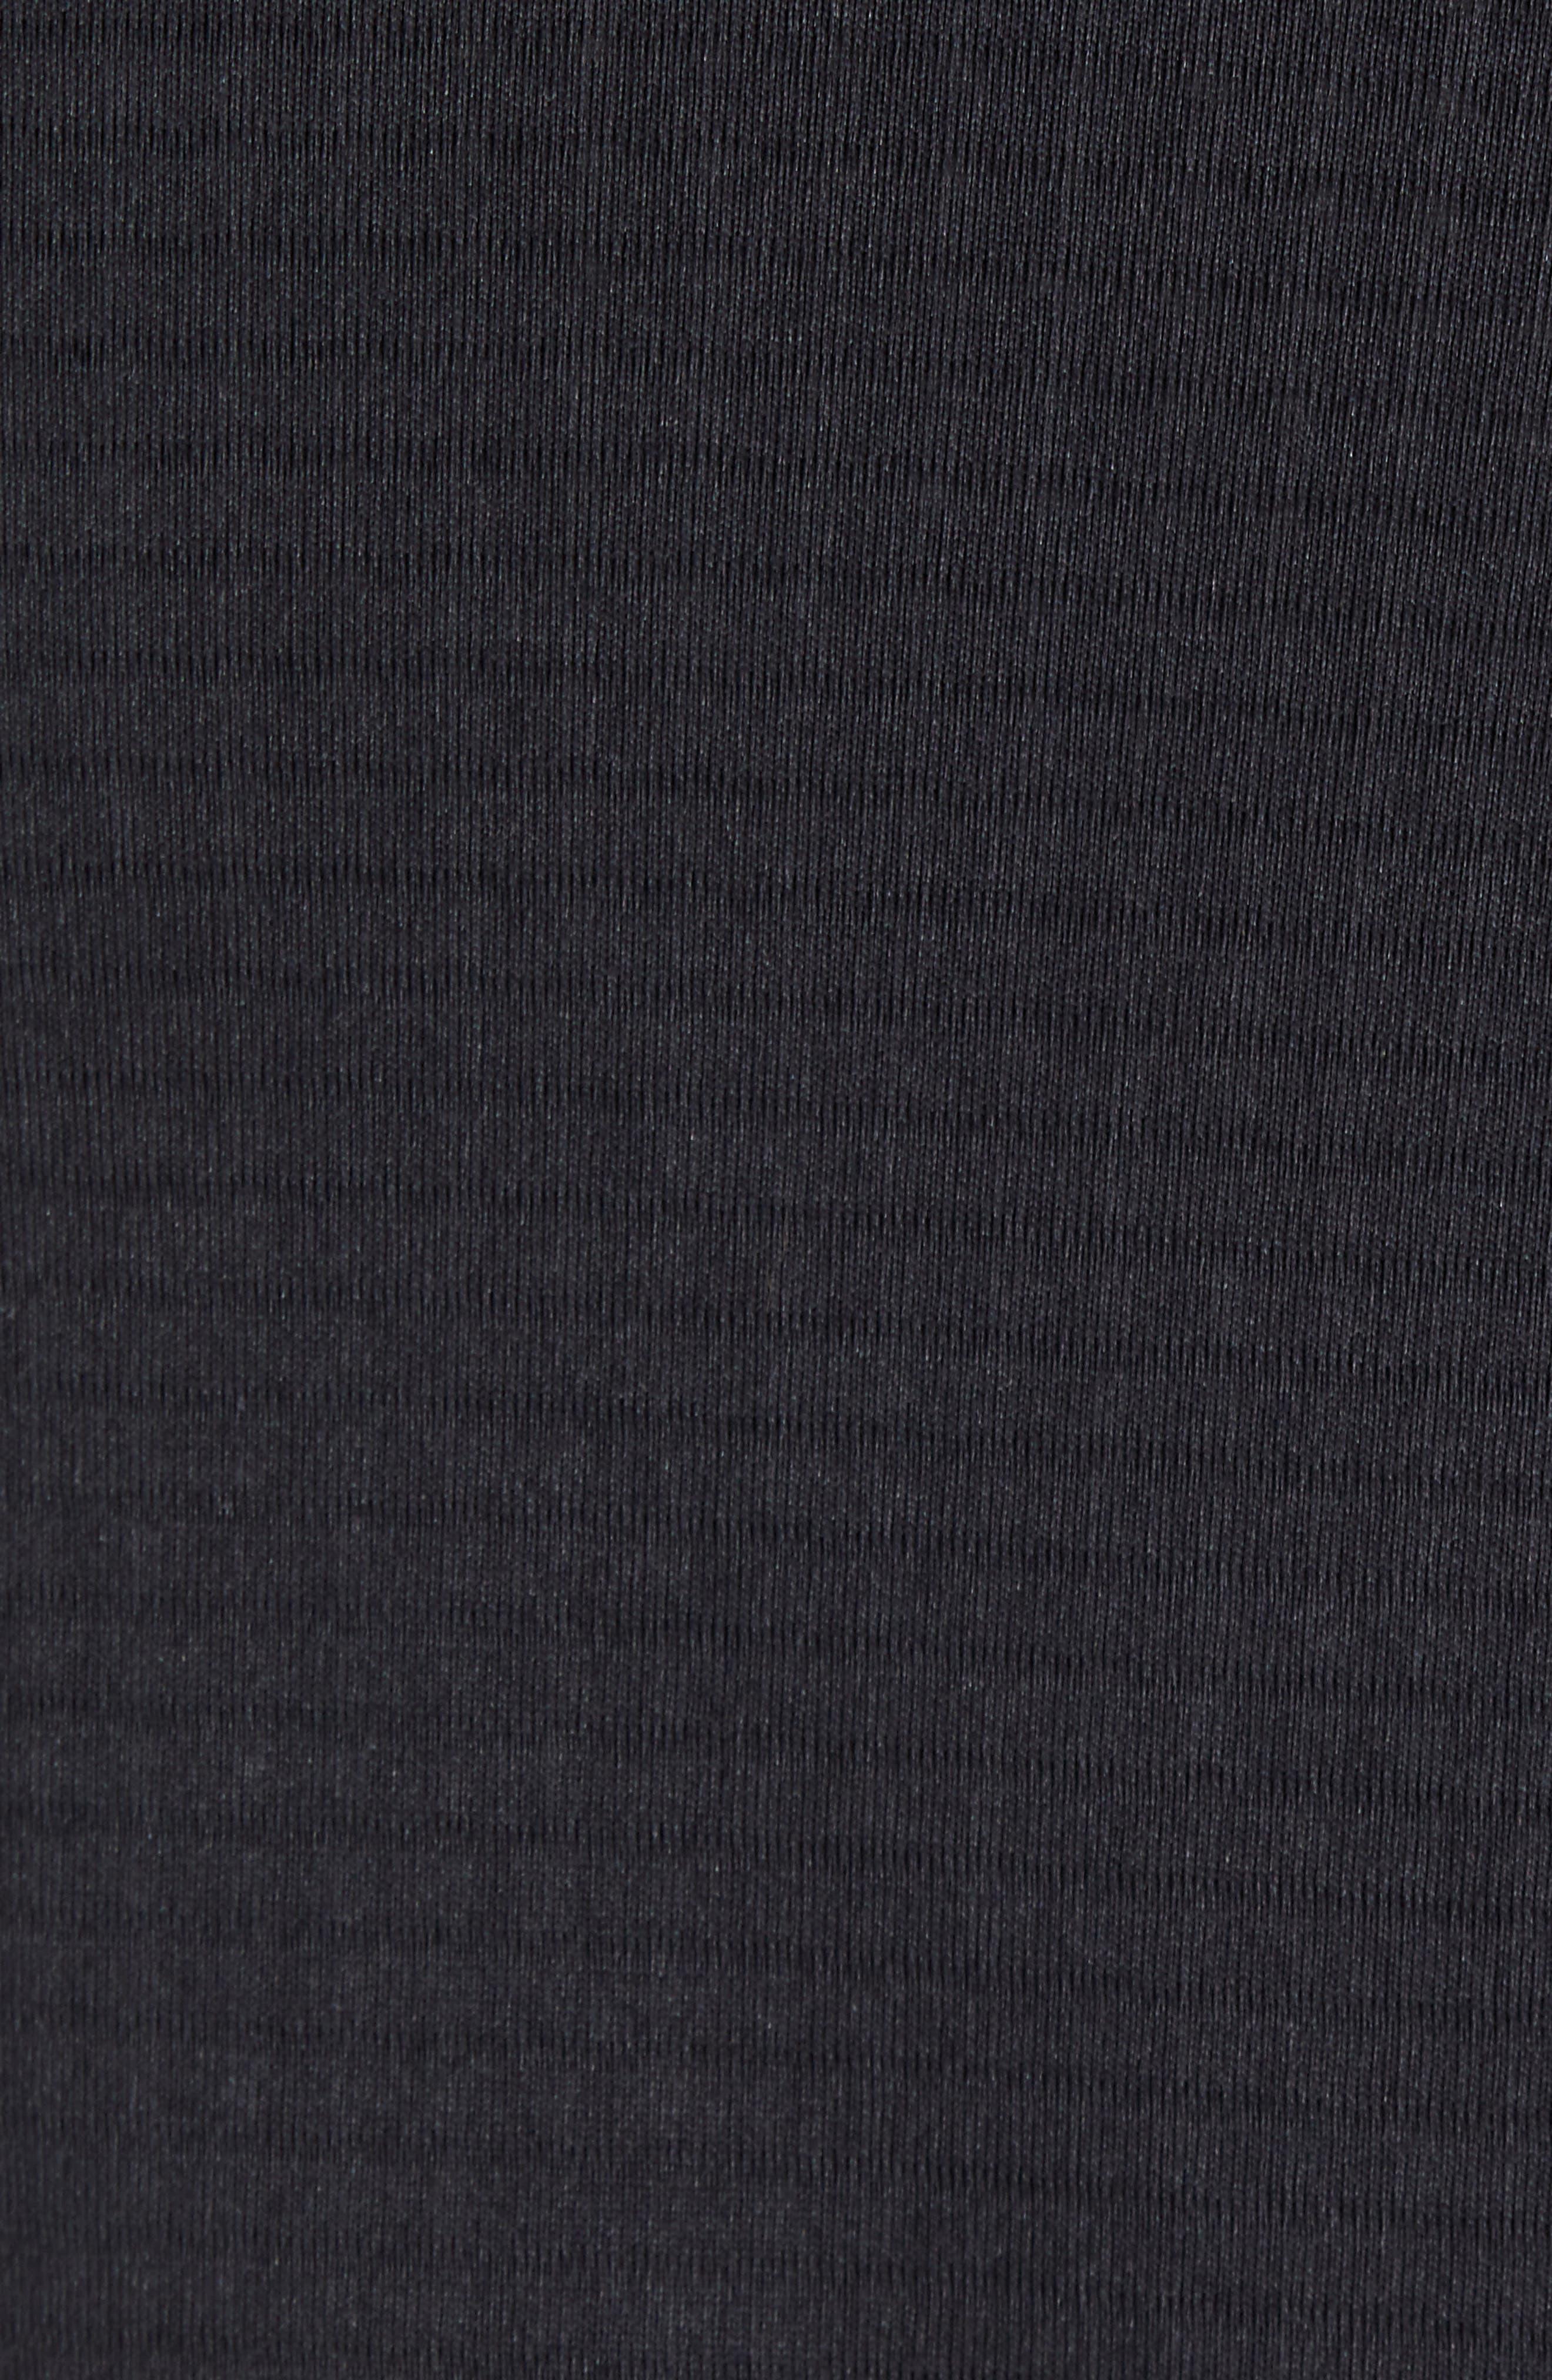 PATAGONIA, R1<sup>®</sup> Full-Zip Hoodie, Alternate thumbnail 5, color, BLACK